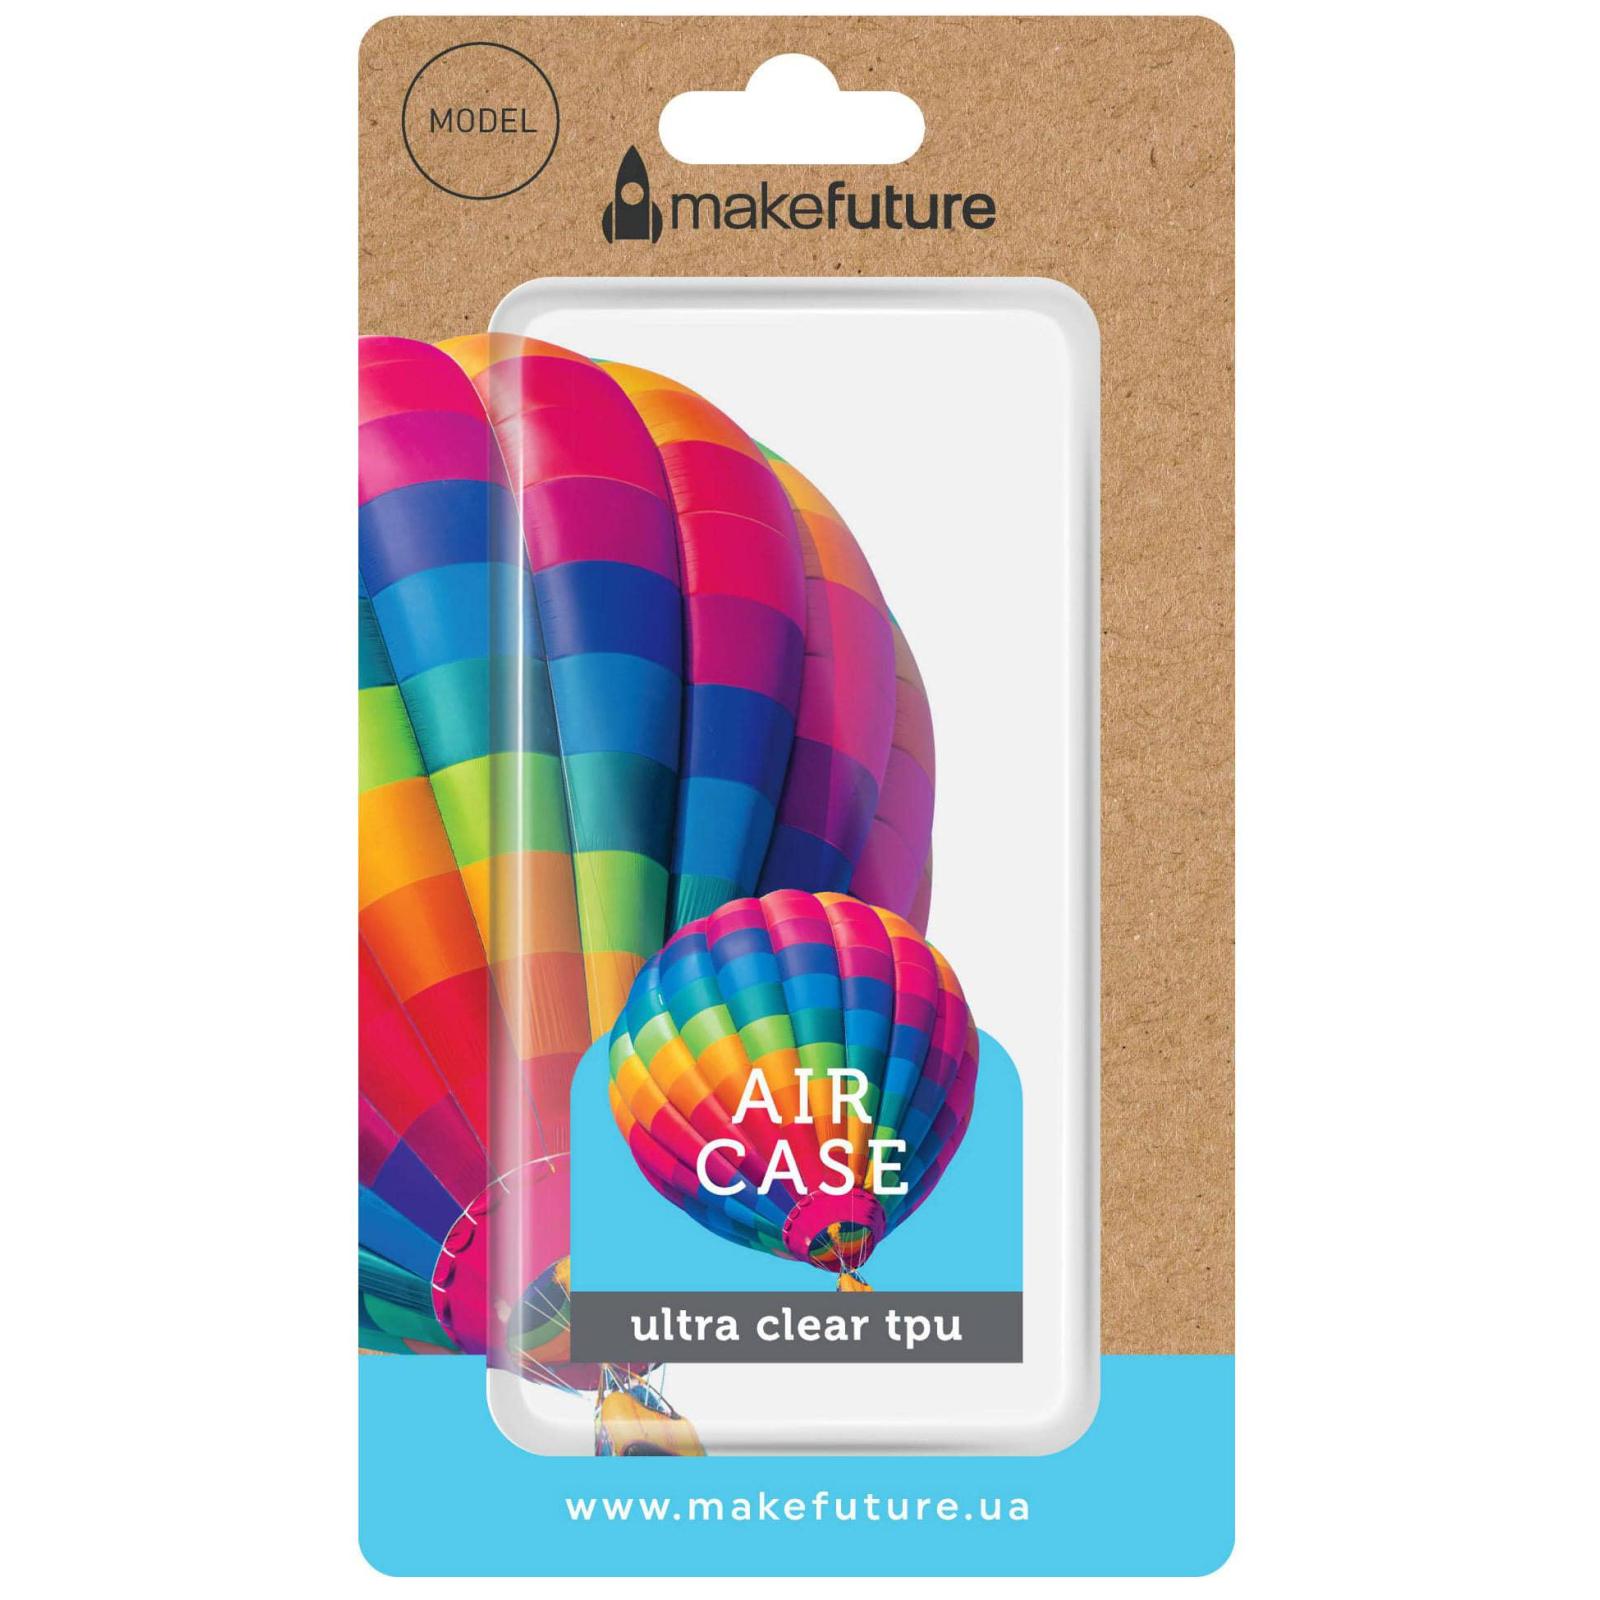 Чехол для моб. телефона MakeFuture Air Case (TPU) для Huawei Mate 10 Lite (MCA-HUM10L)